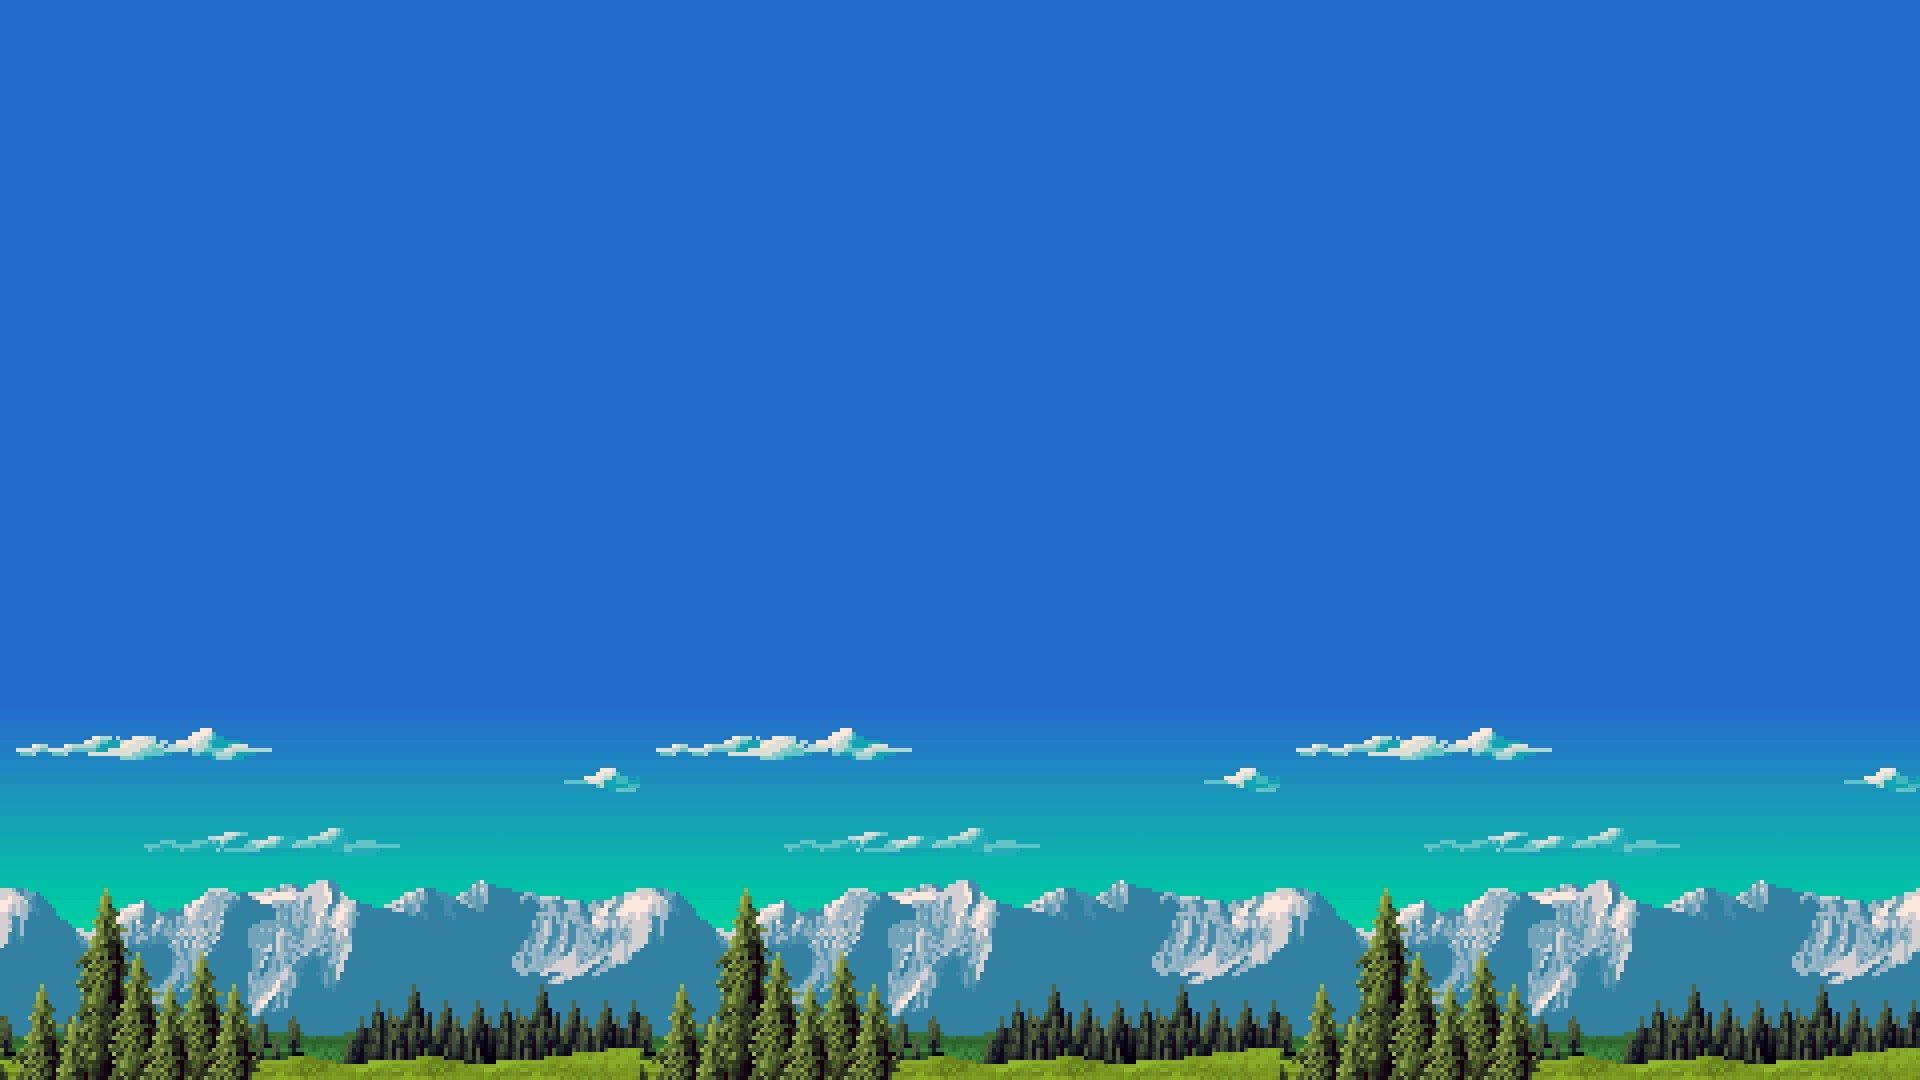 8 Bit Wallpaper 25